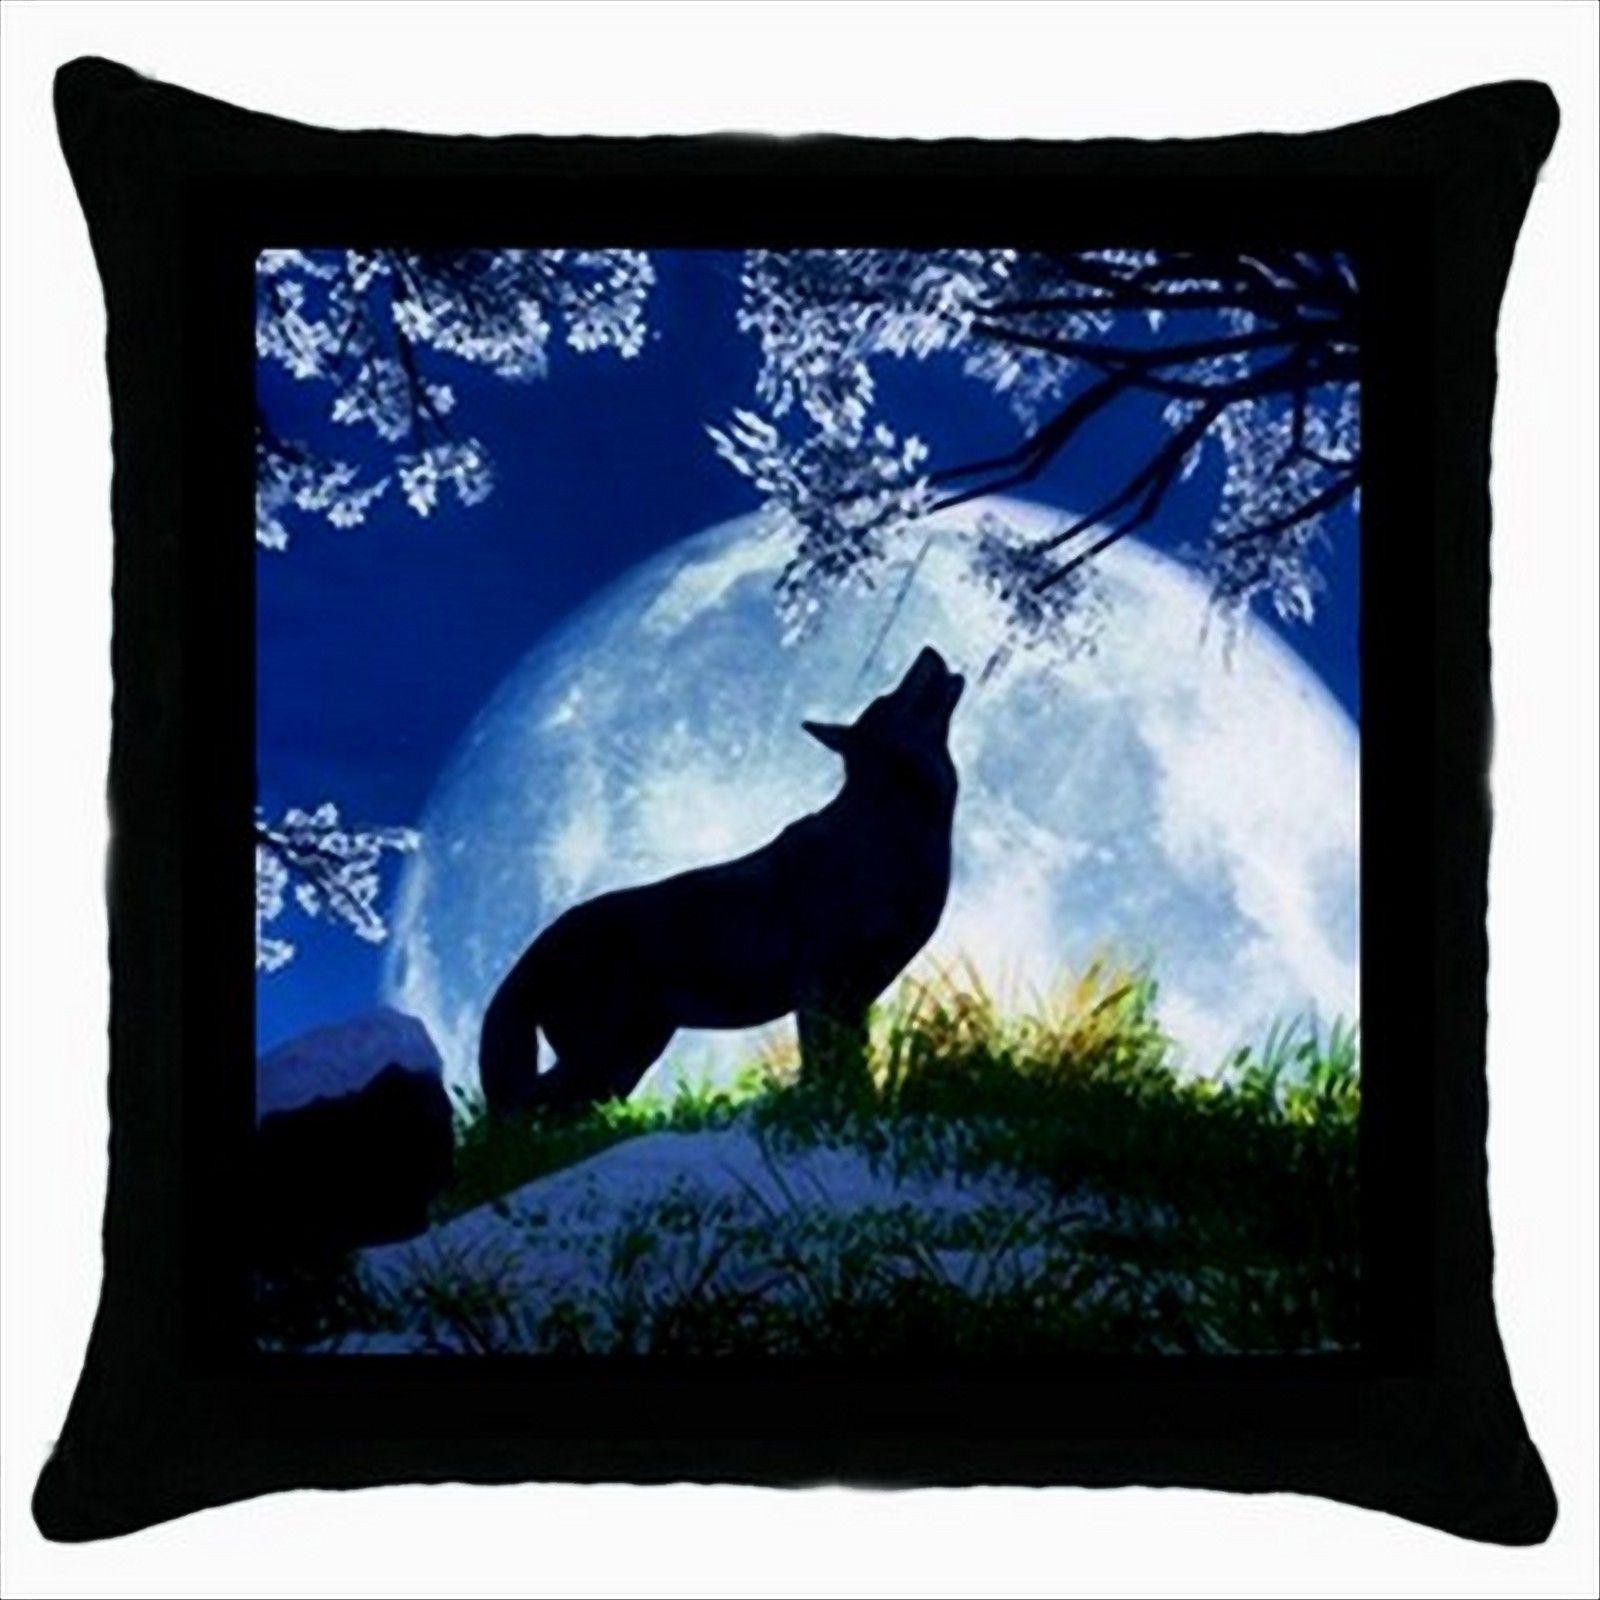 NEW* HOT CUTE MOON WOLF Cushion Cover Throw Pillow Case Decor Design Gift